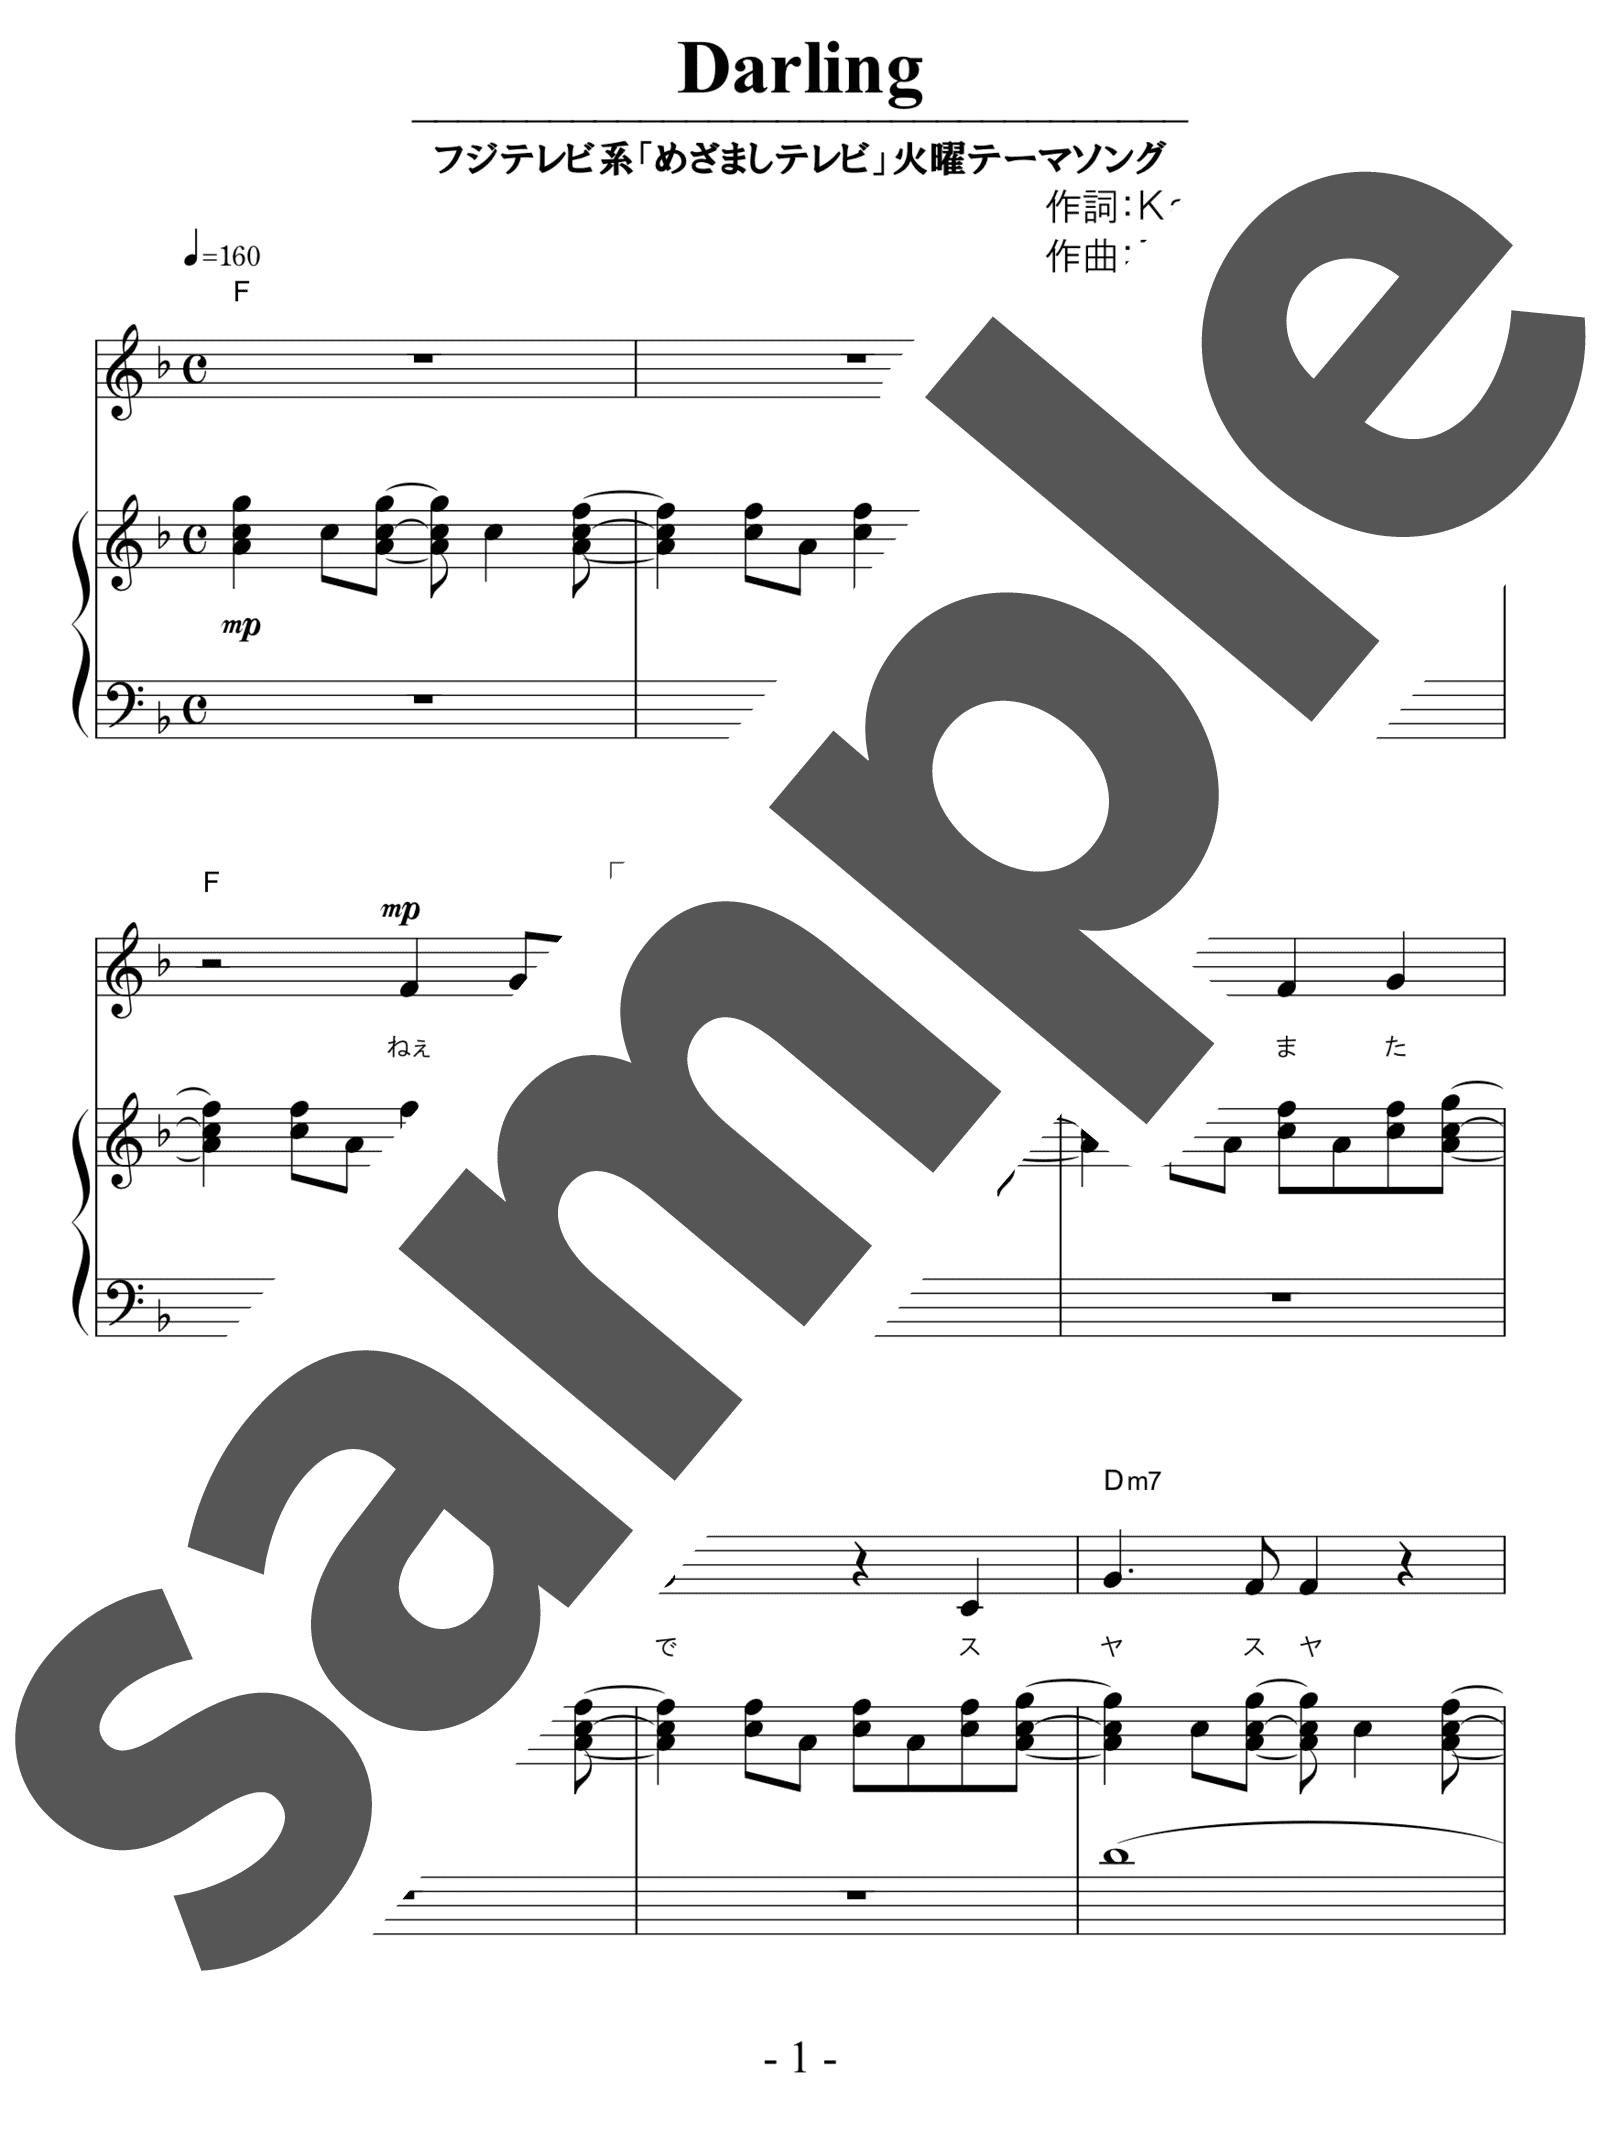 「Darling」のサンプル楽譜